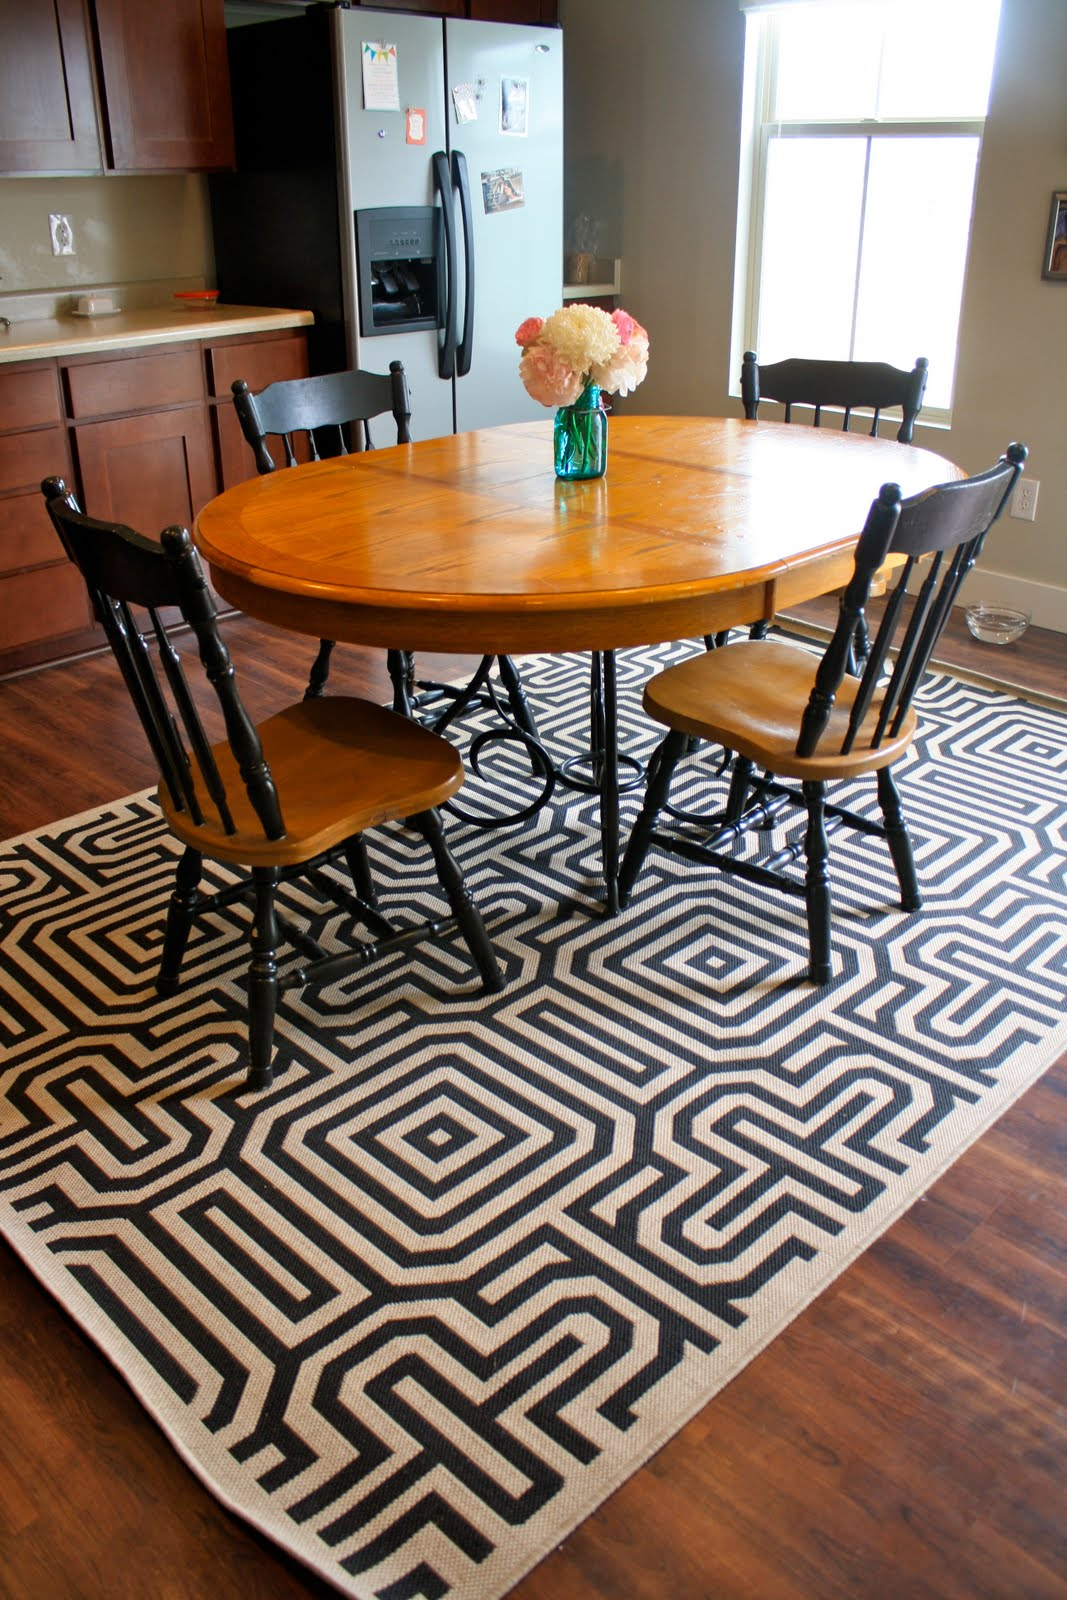 Rug For Kitchen Table Linoleum Flooring New House Of Jade Interiors Blog